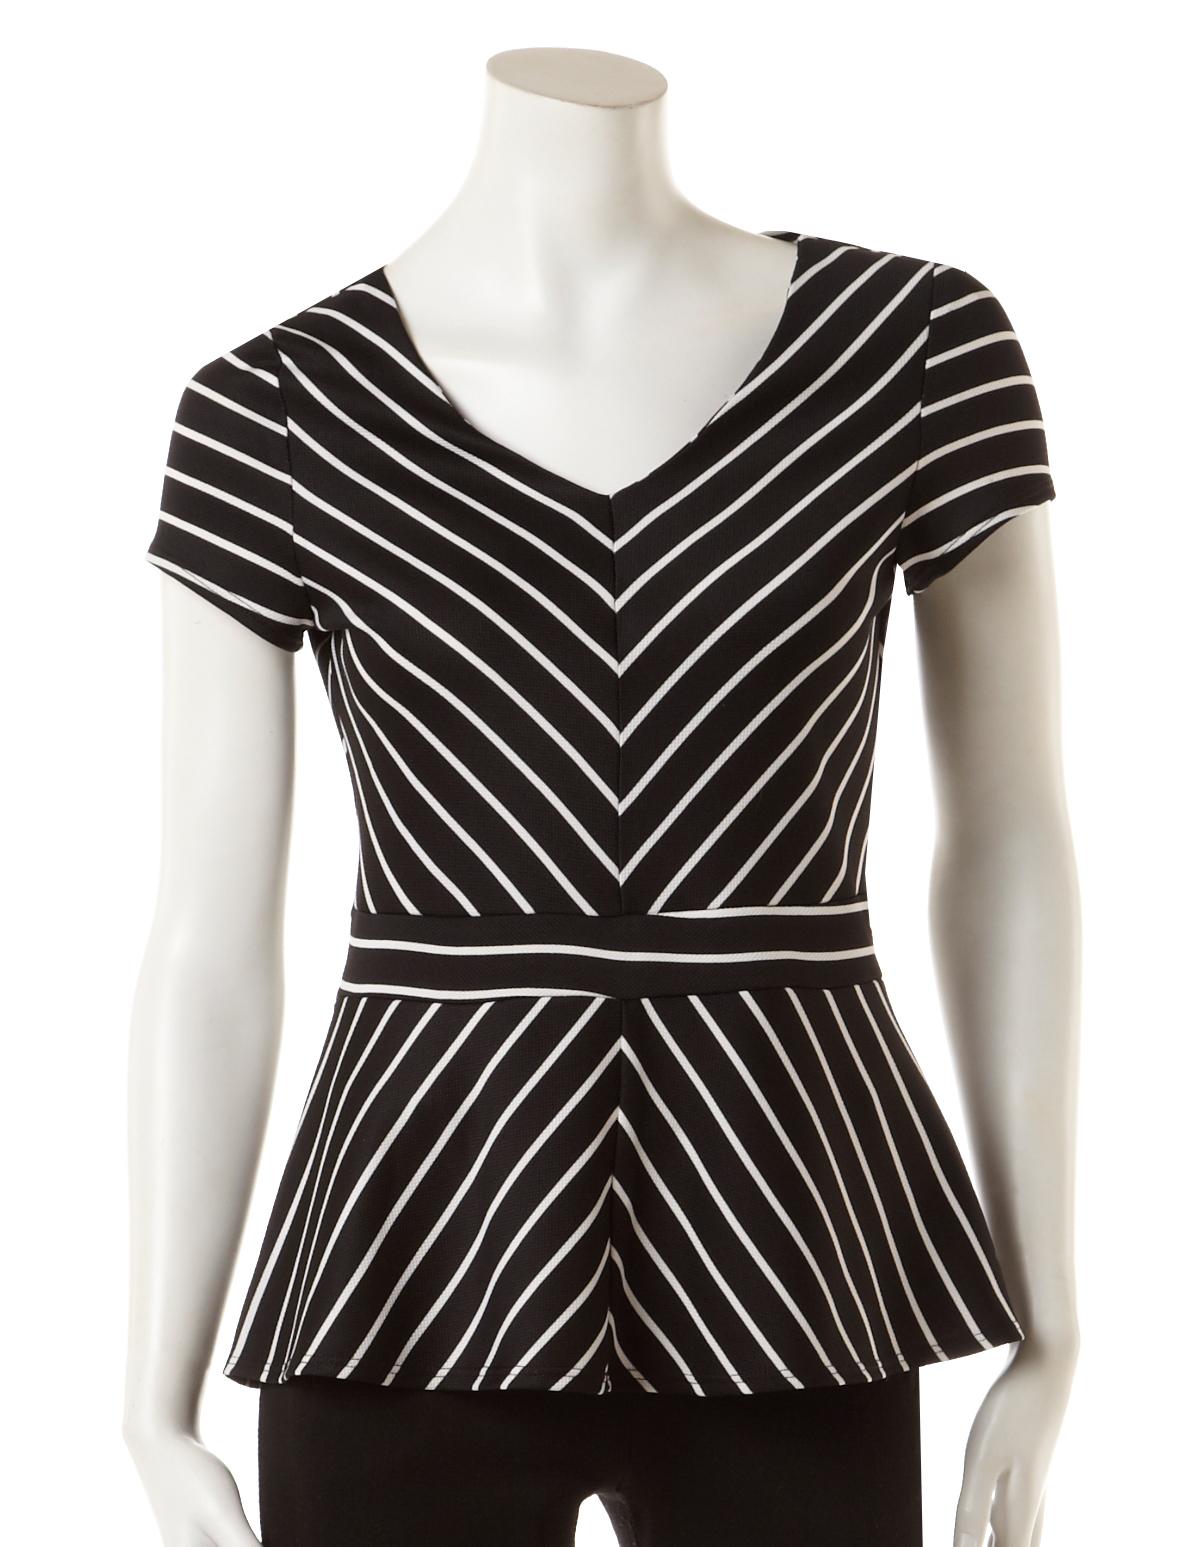 4dc2f7e77624fb Chevron Stripe Peplum Top, Black/White Stripe, hi-res